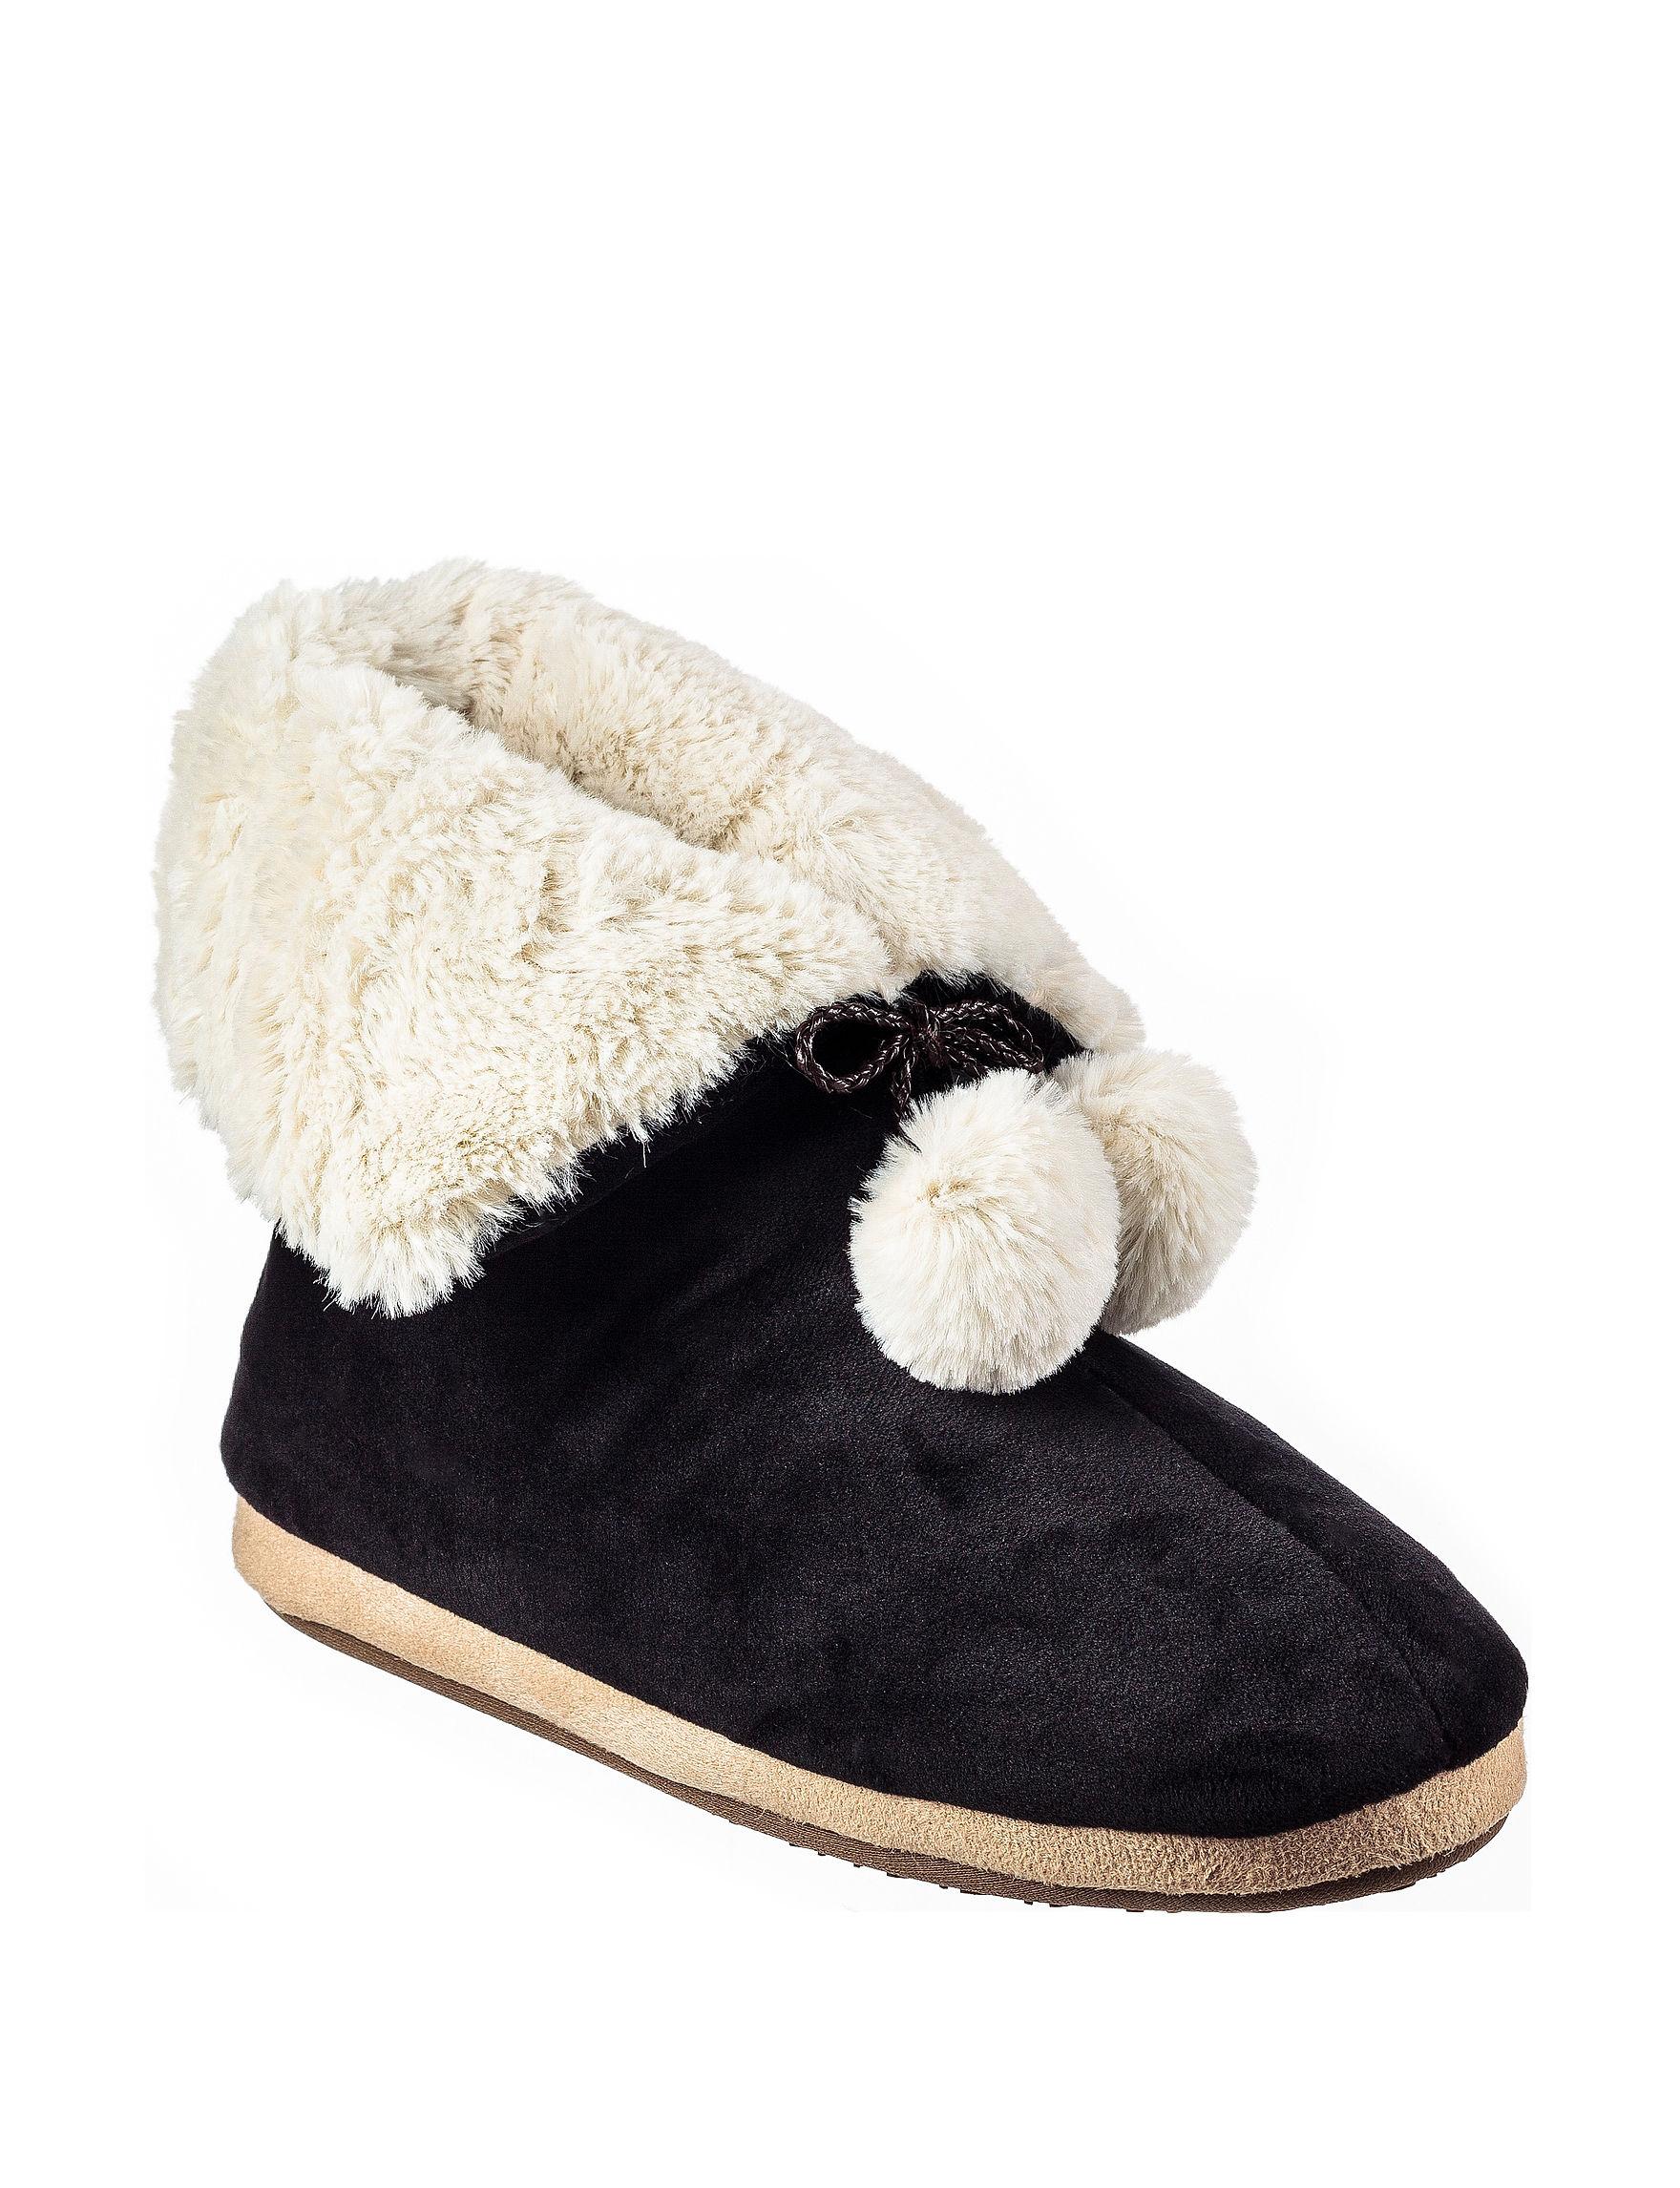 Cuddl Duds Black Slipper Boots & Booties